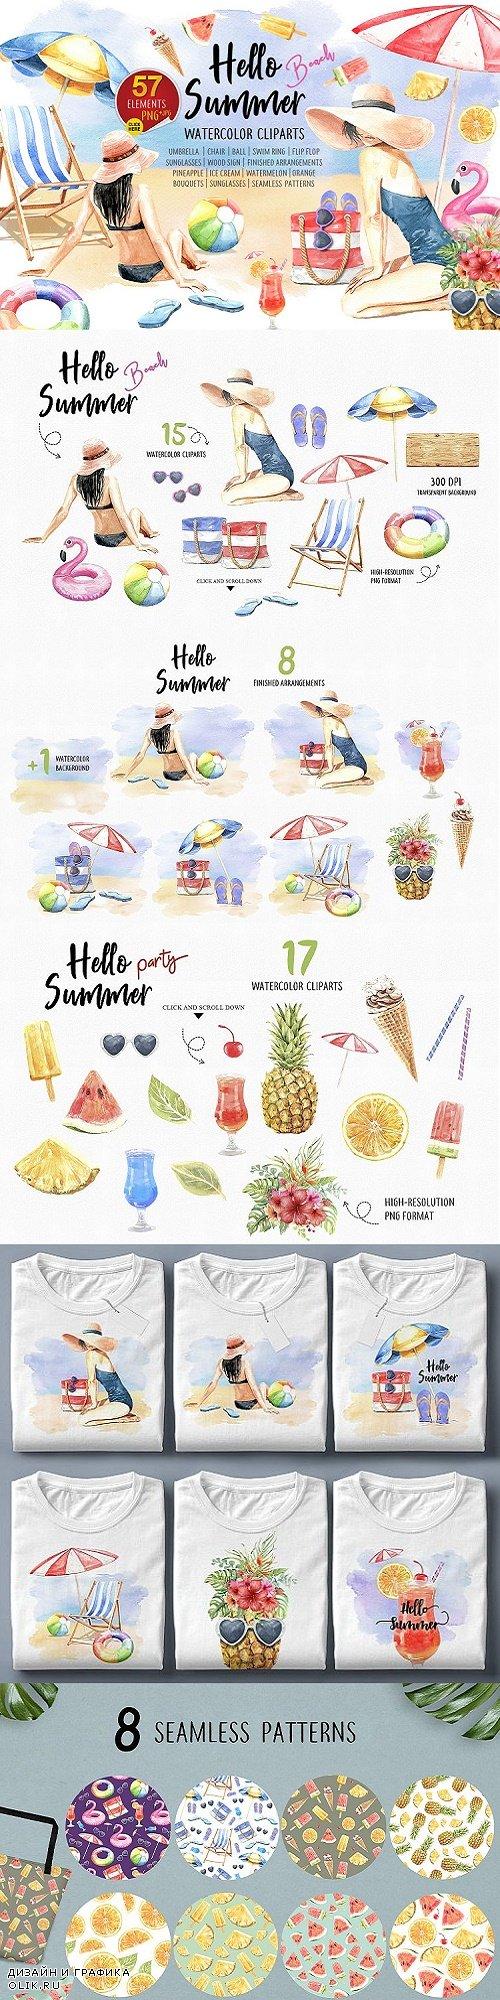 Summer Beach Party, Watercolor Women - 3914118